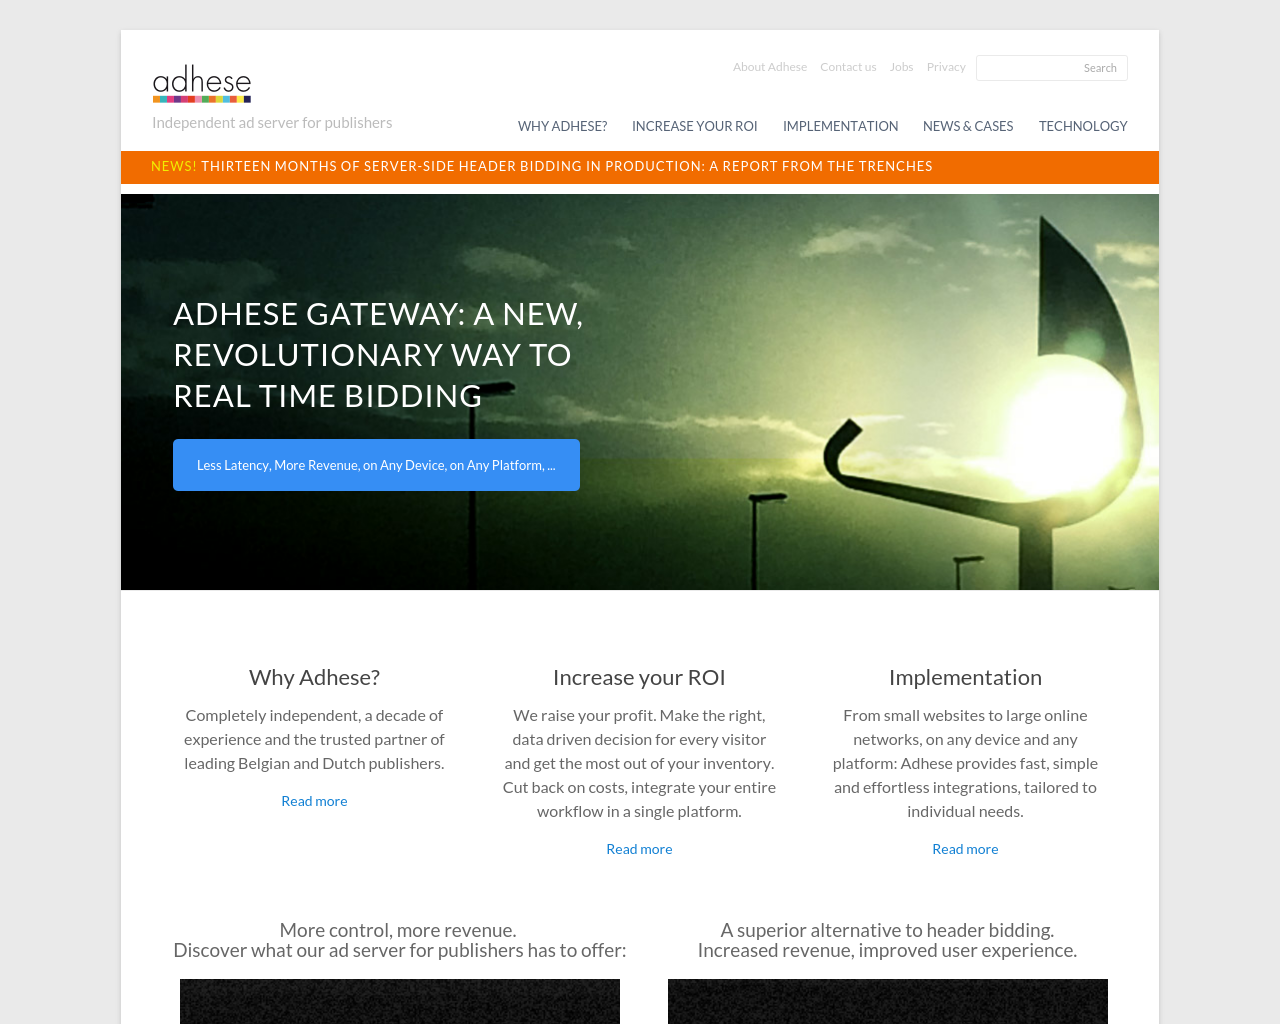 Adhese-Advertising-Reviews-Pricing